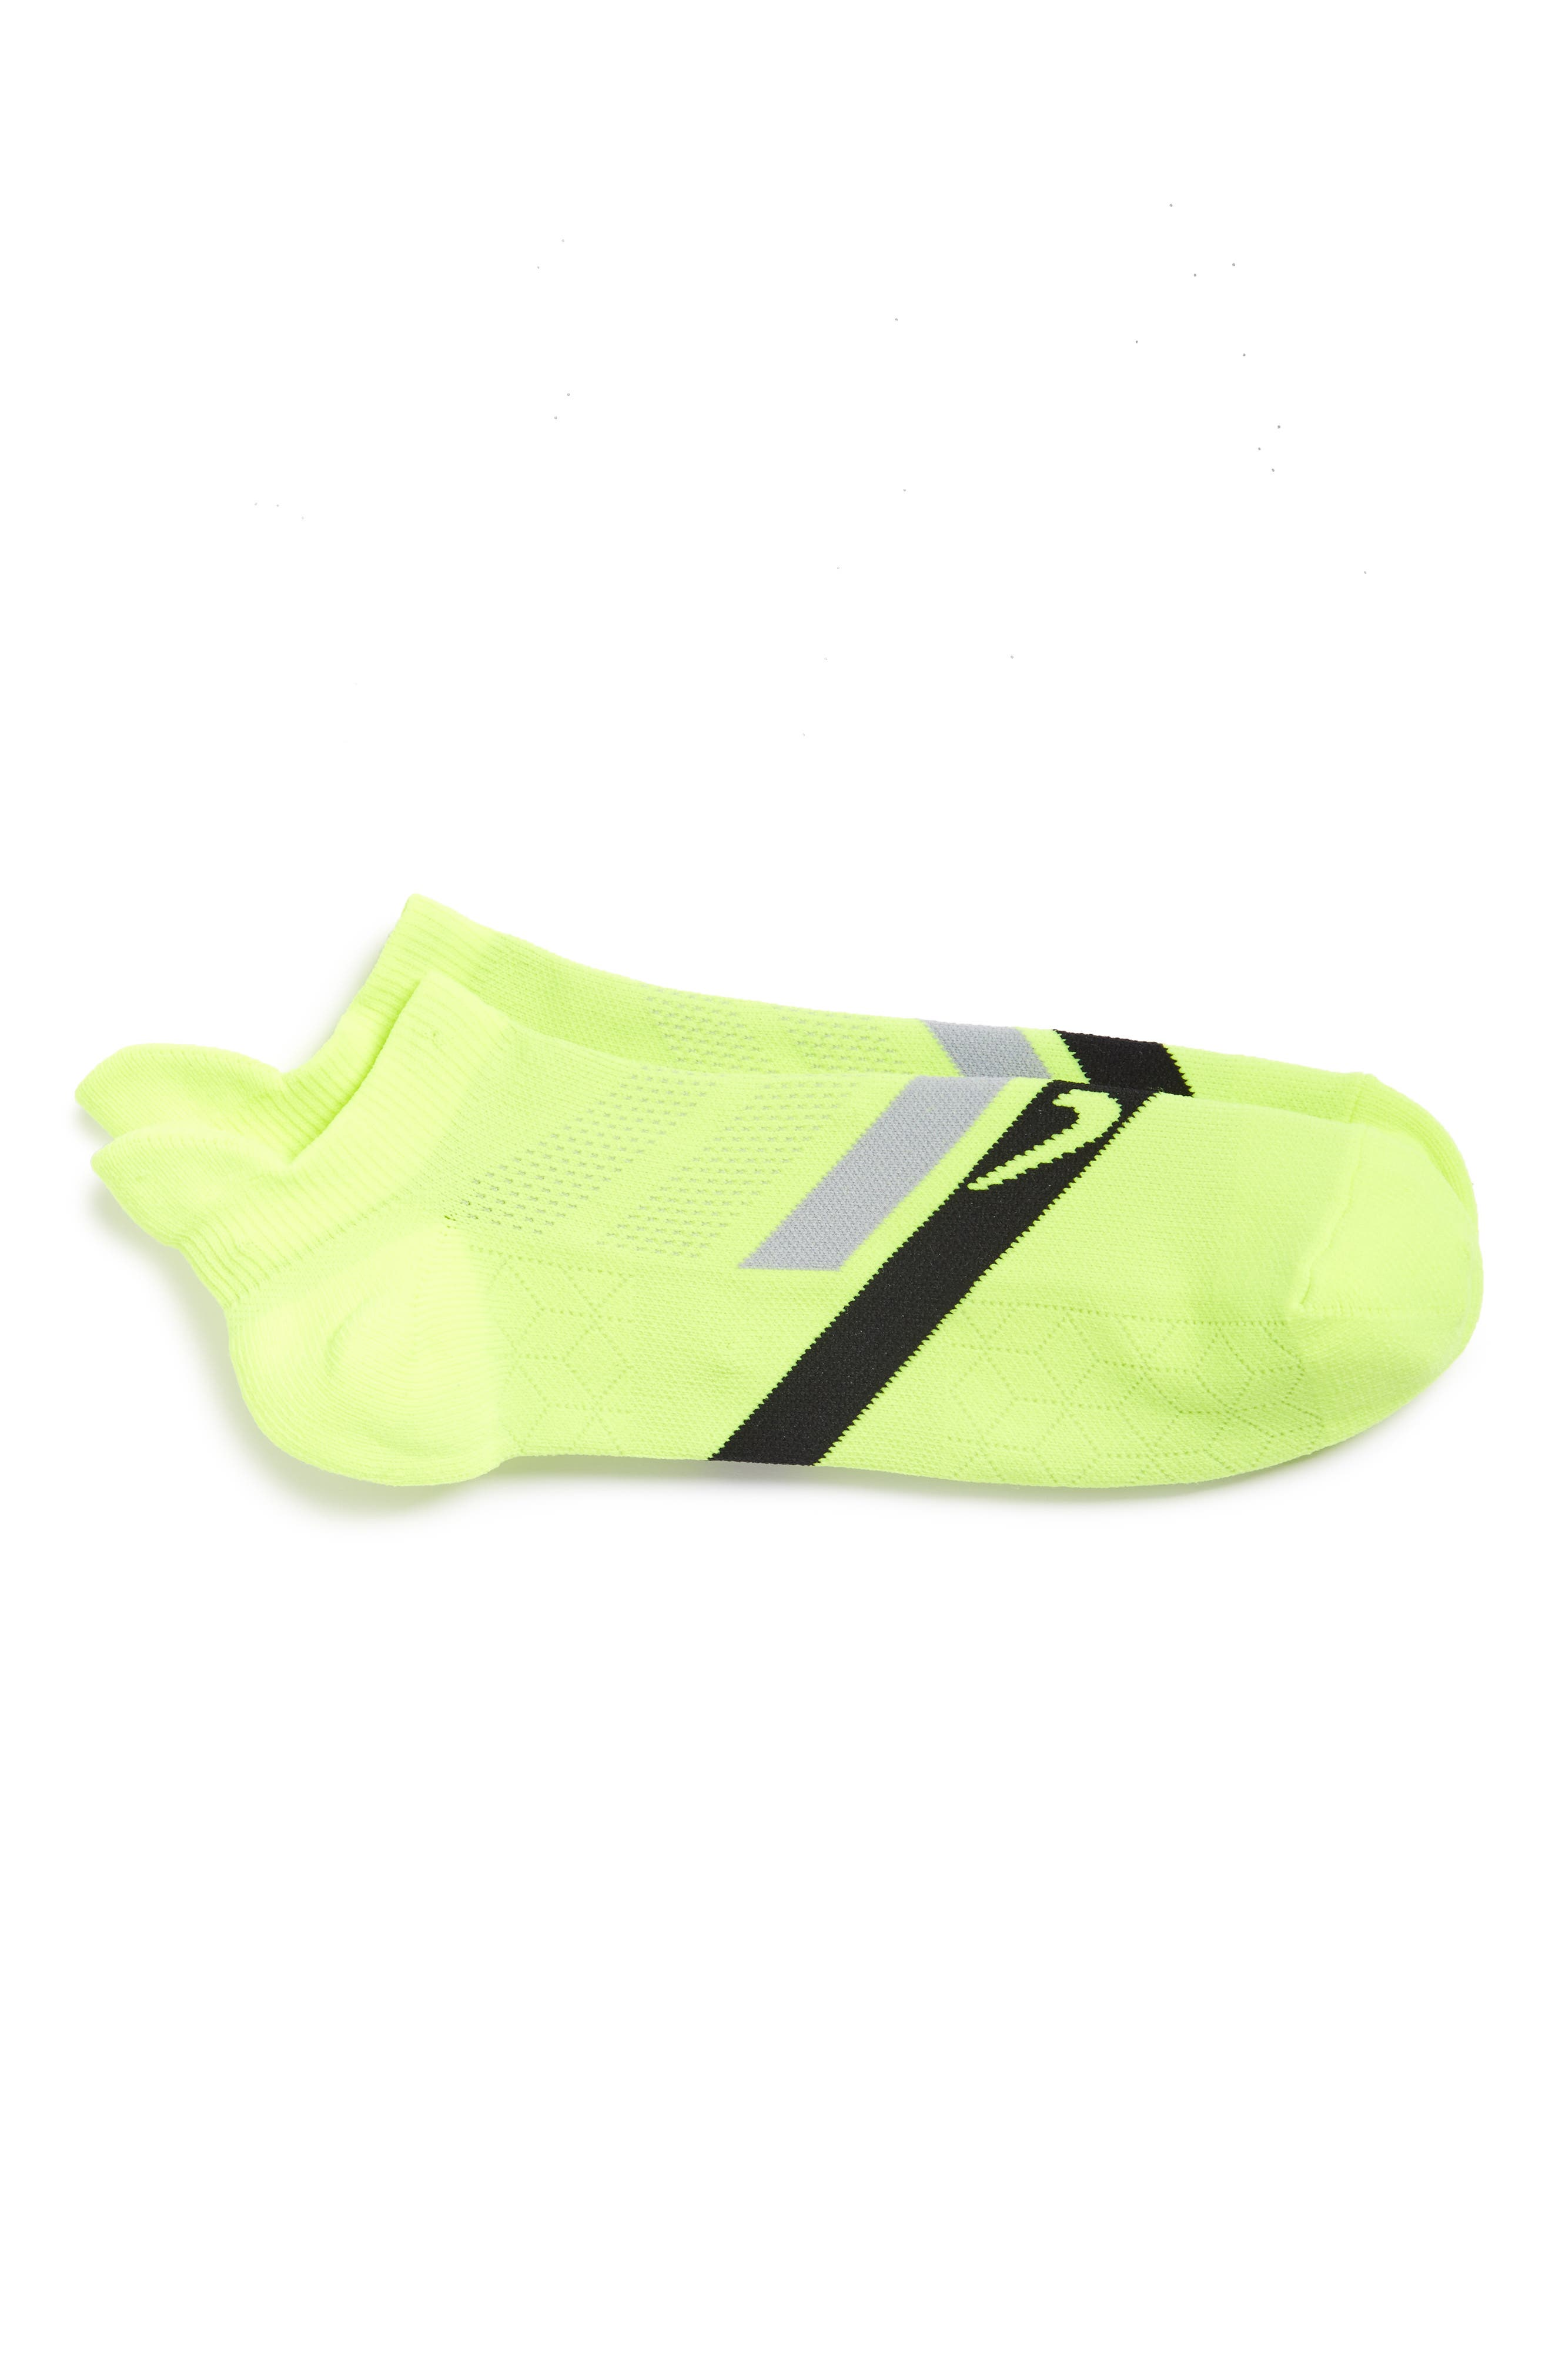 Alternate Image 1 Selected - Nike Performance Cushion No-Show Socks